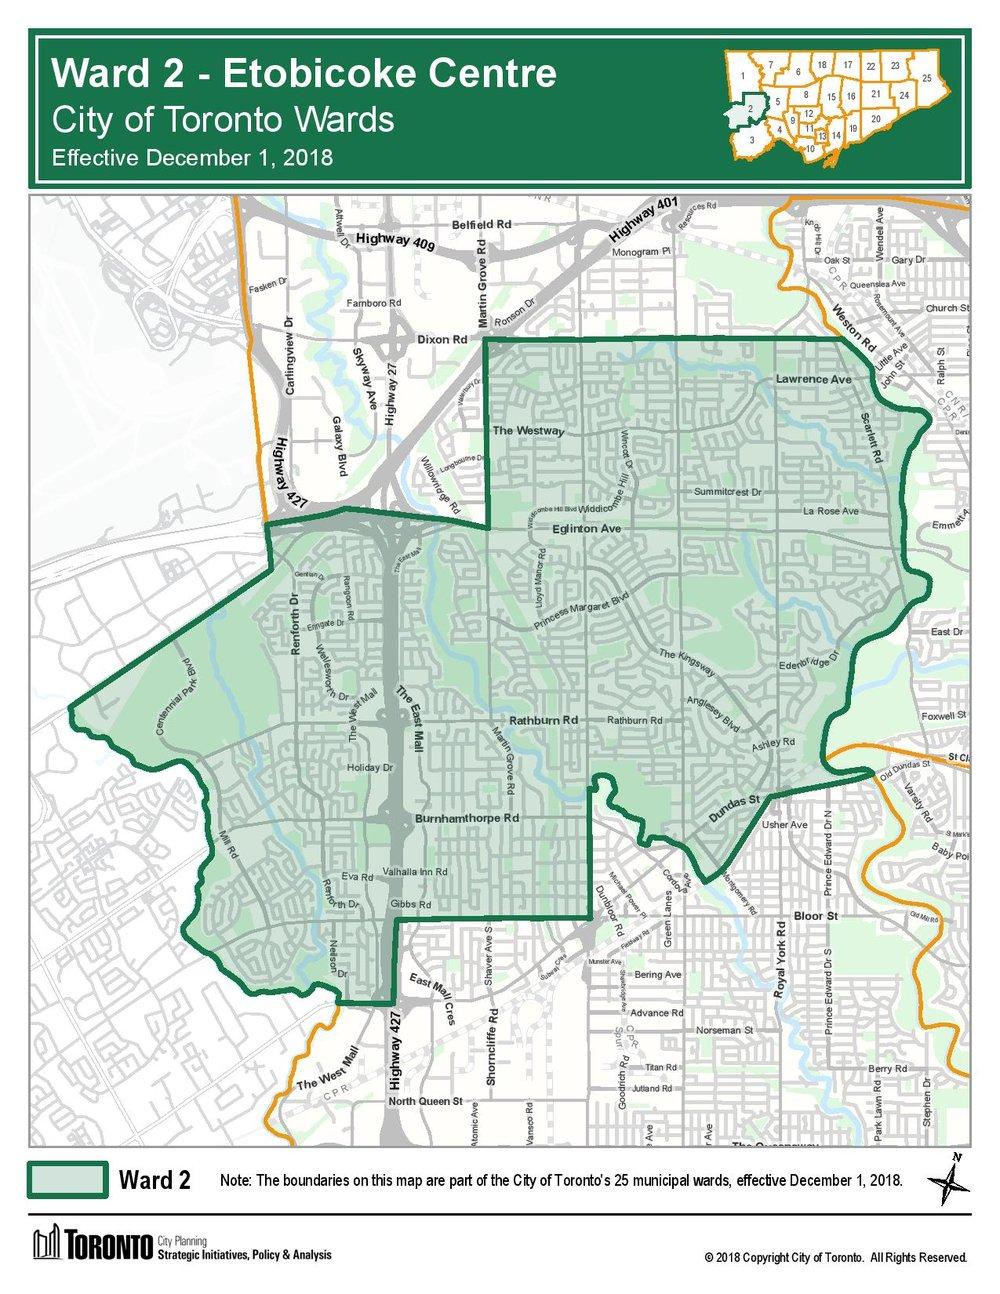 9193-City_Planning_2018_25WardMaps_Ward02-page-001.jpg